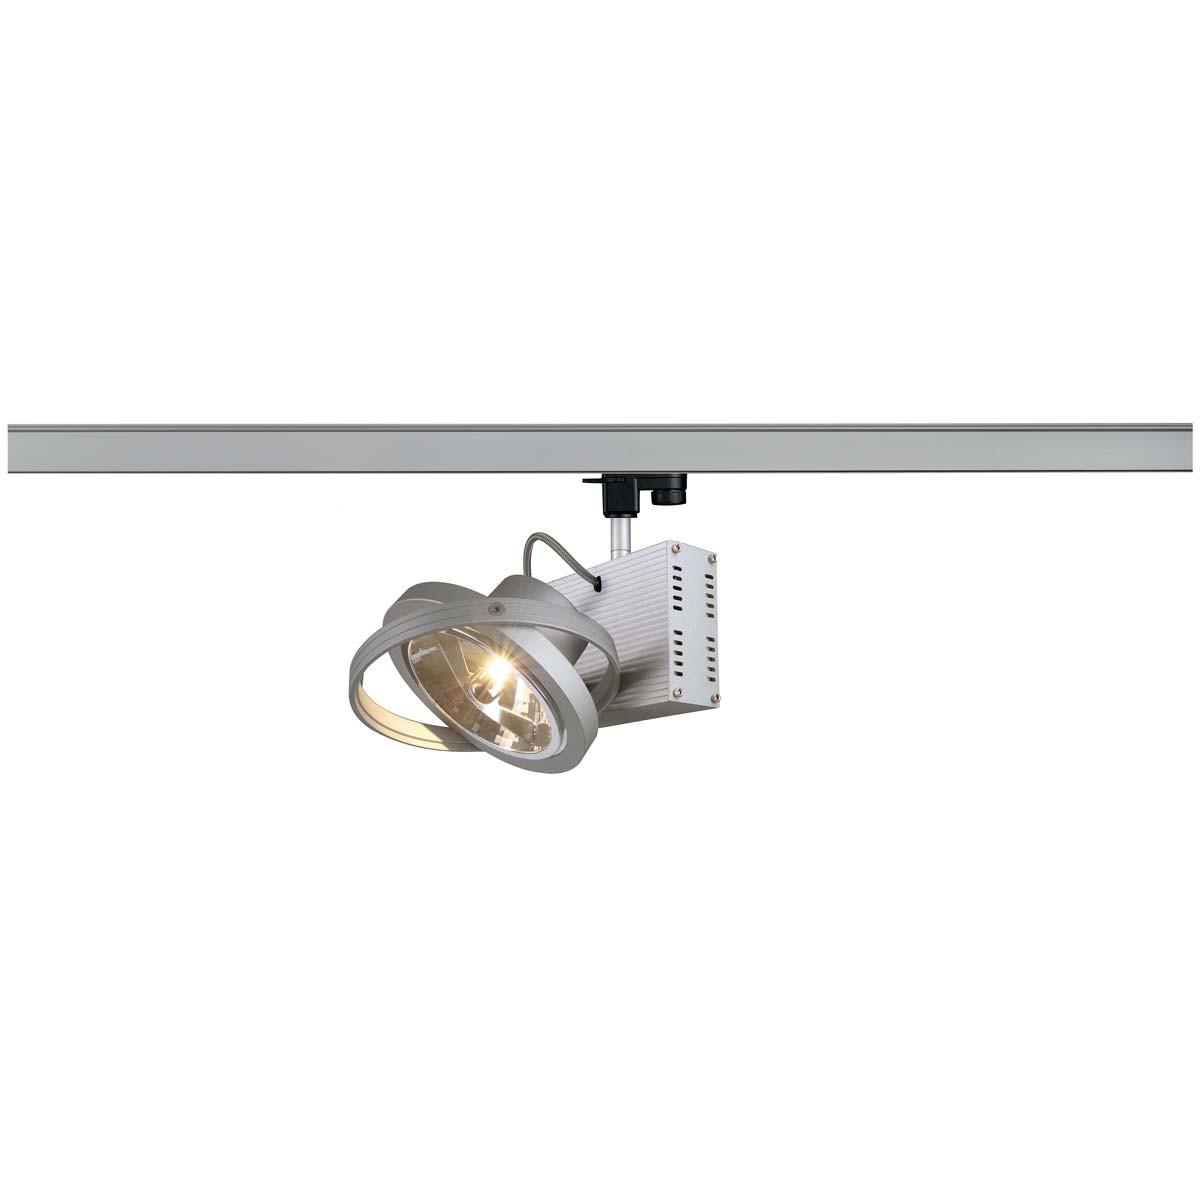 SLV 153002 Tec 1 QRB 50W Silver Grey Eutrac 3 Circuit 240V Track Light